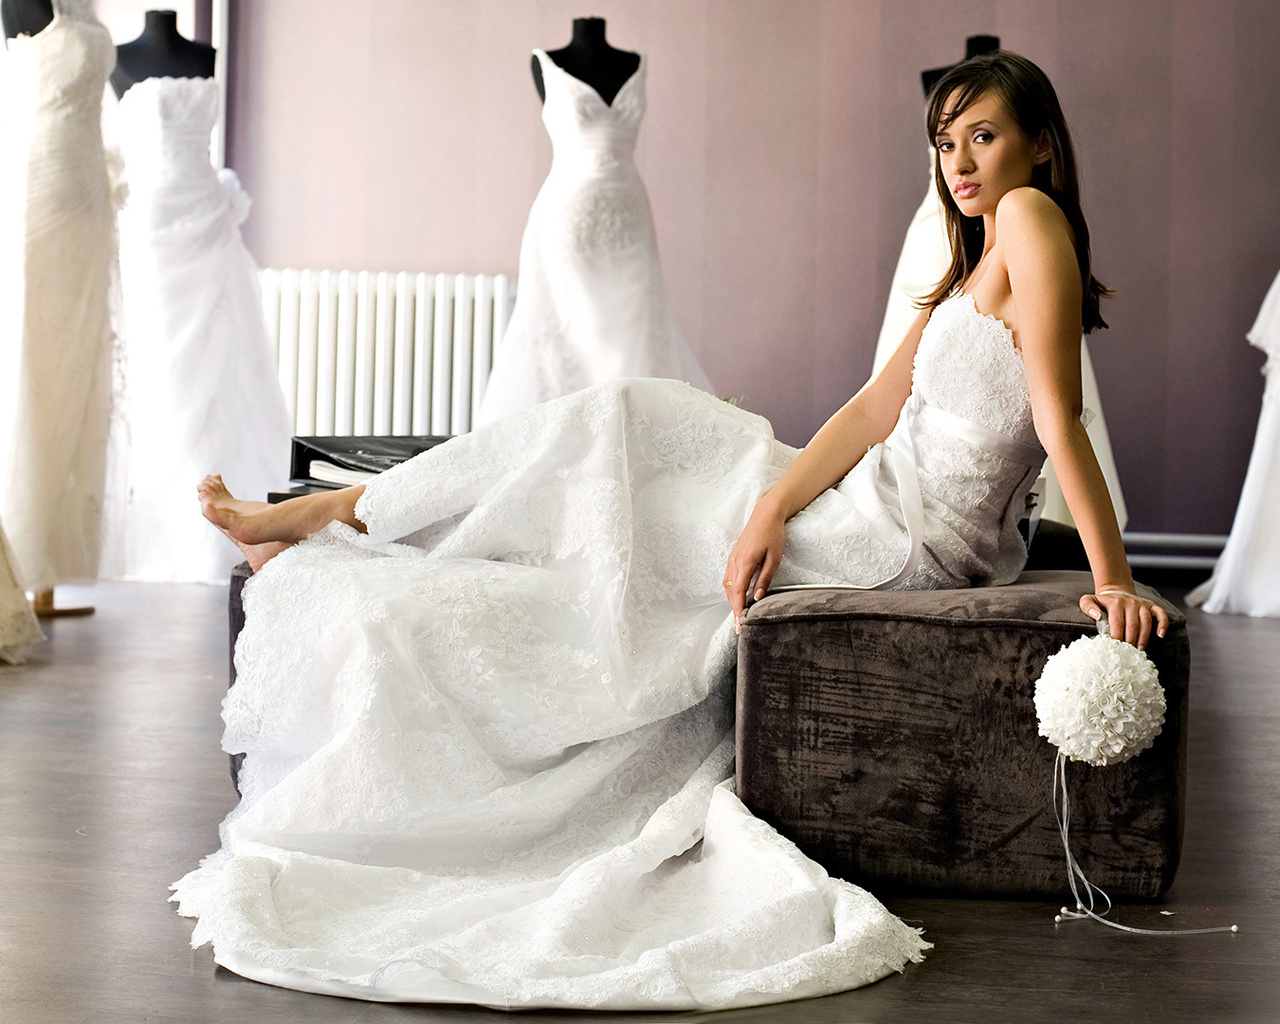 bae616e2a11a453 Свадебные платья оптом в России, свадебные платья оптом в Черновцах